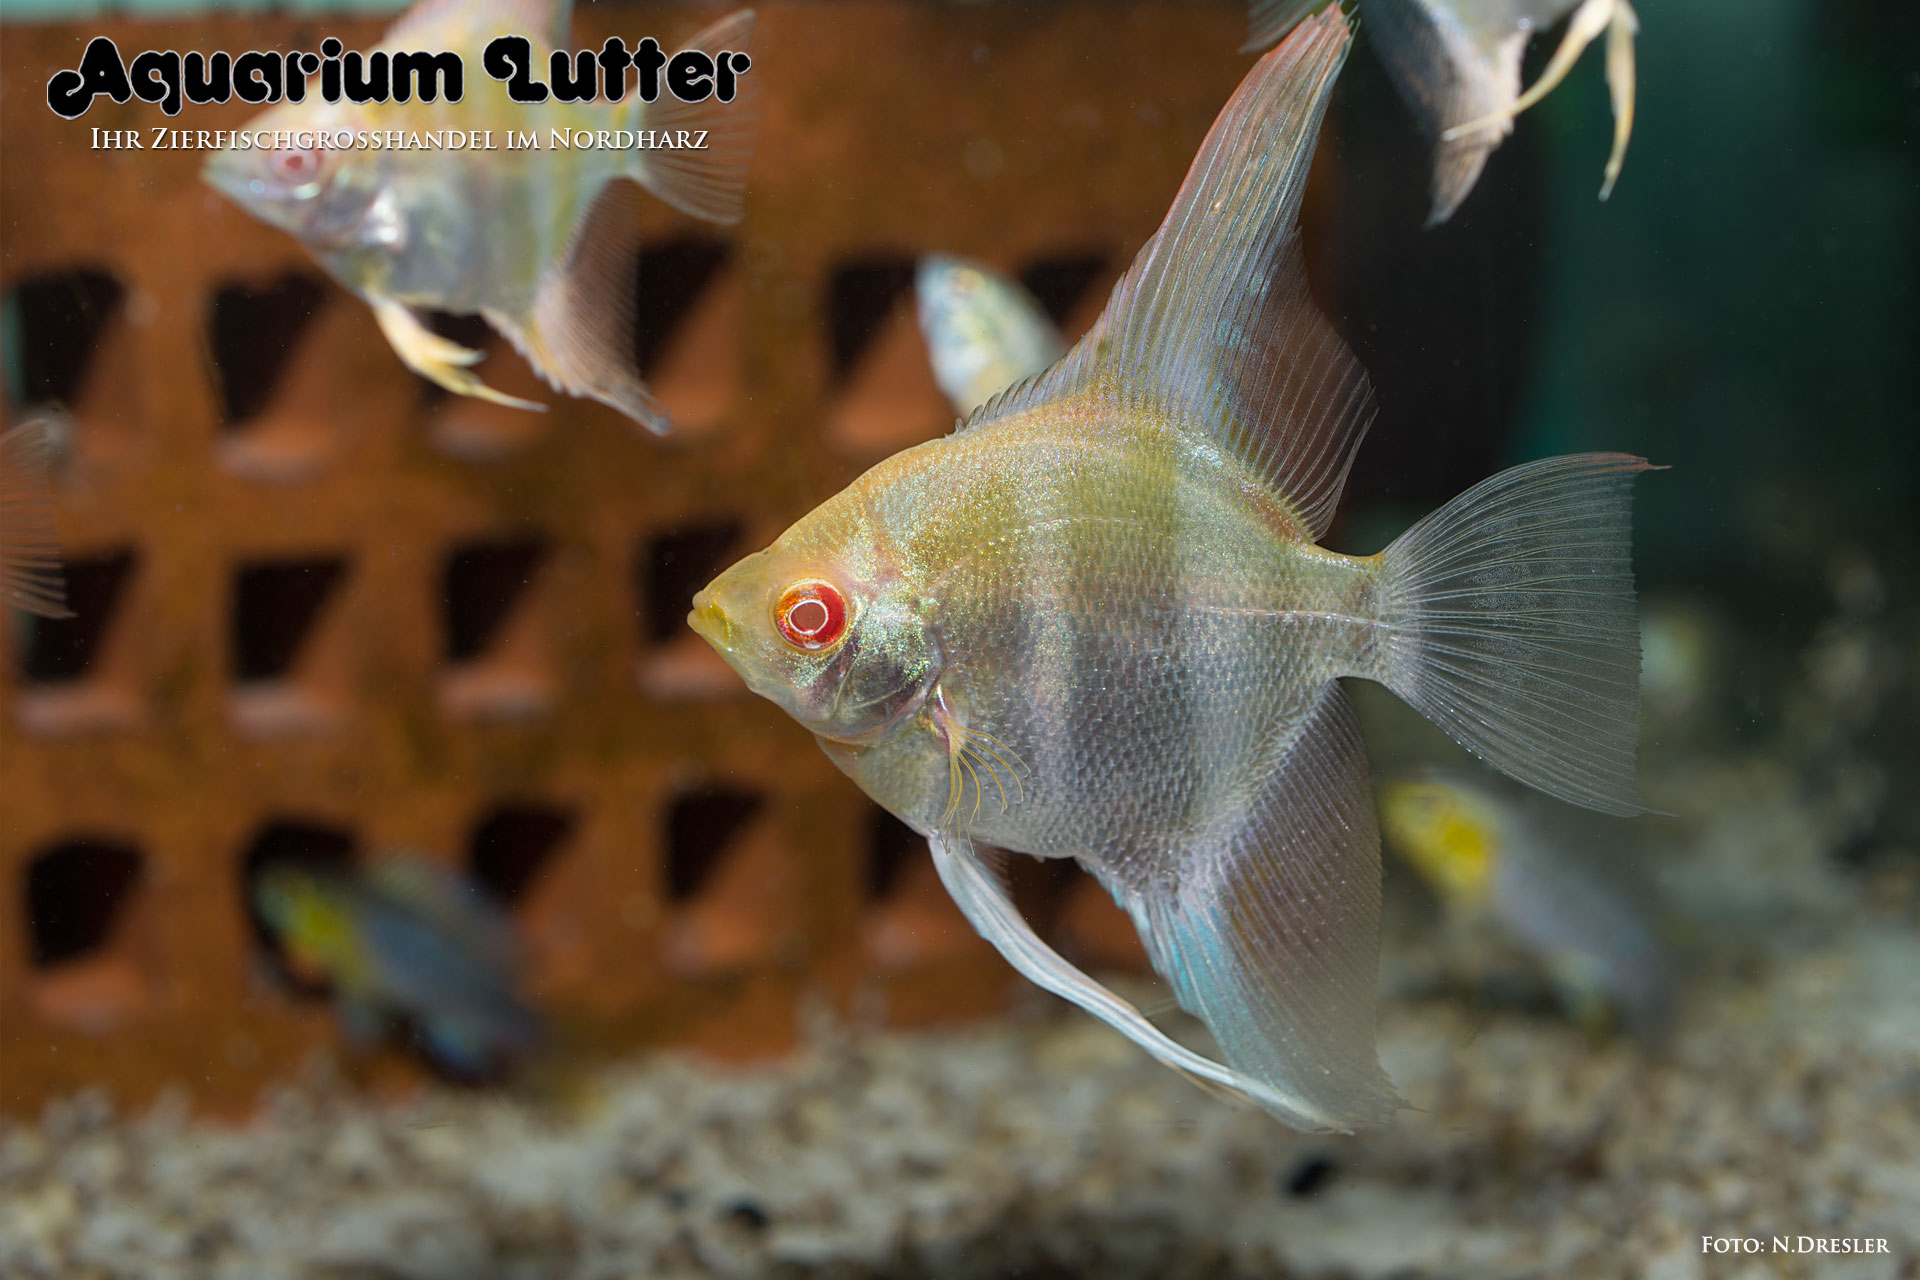 Aquarium lutter galerie amerikanische buntbarsche for Peru altum skalar